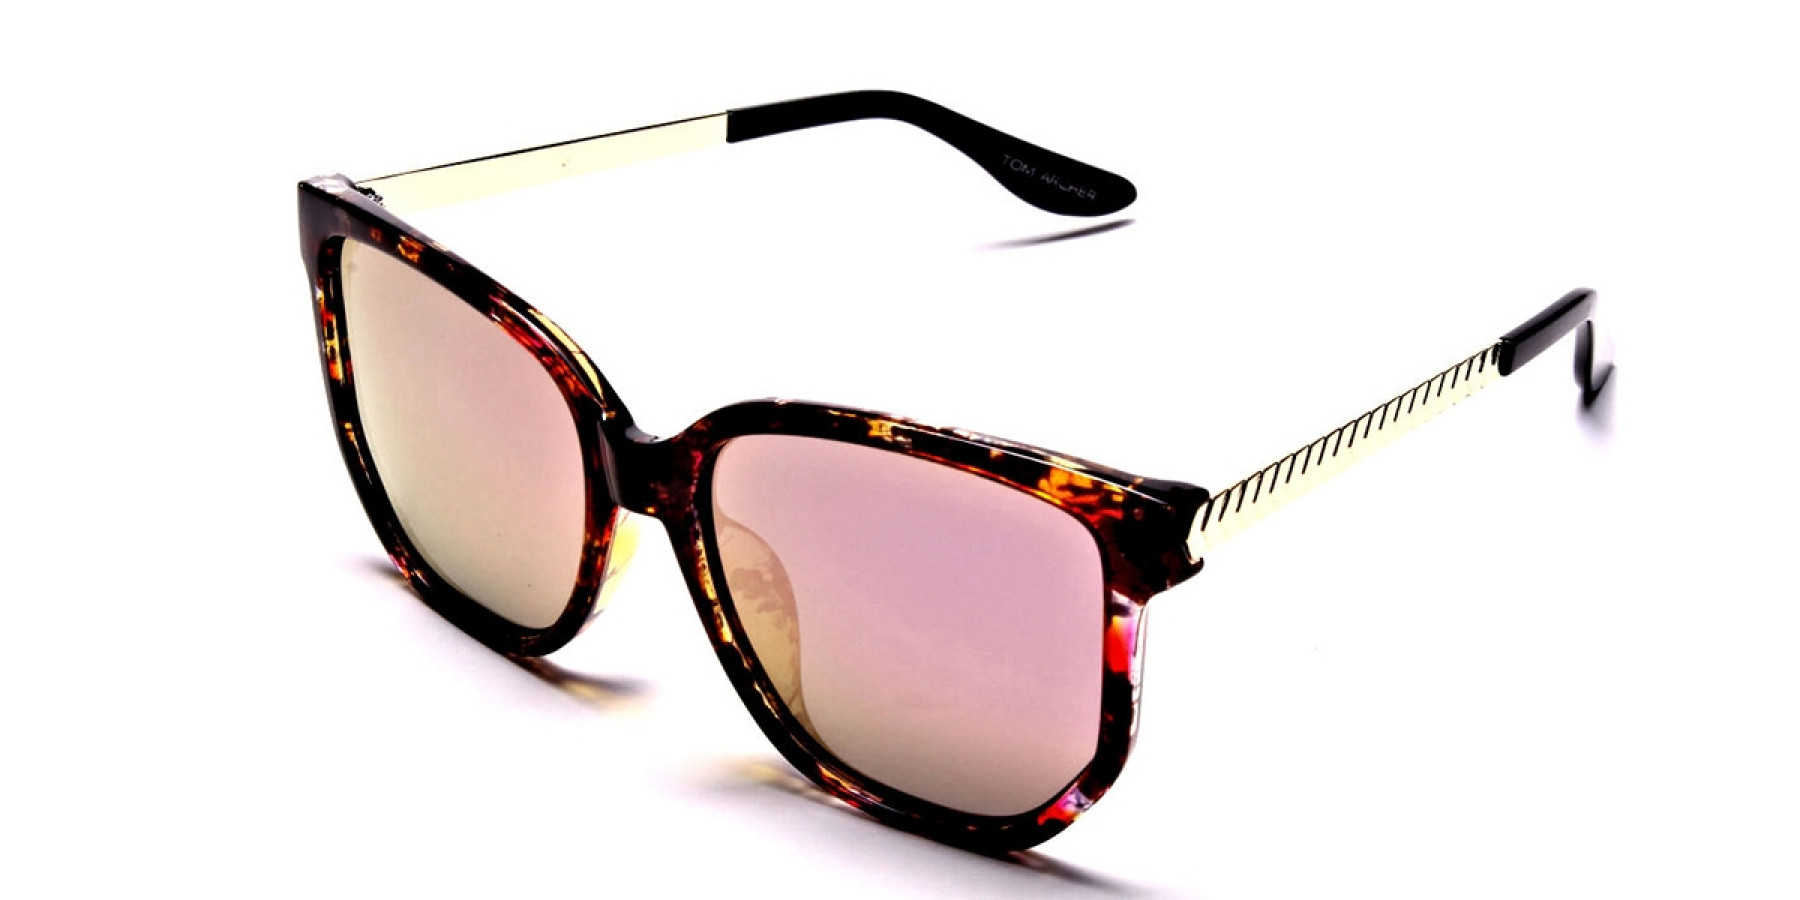 Classy Tortoiseshell Sunglasses -2